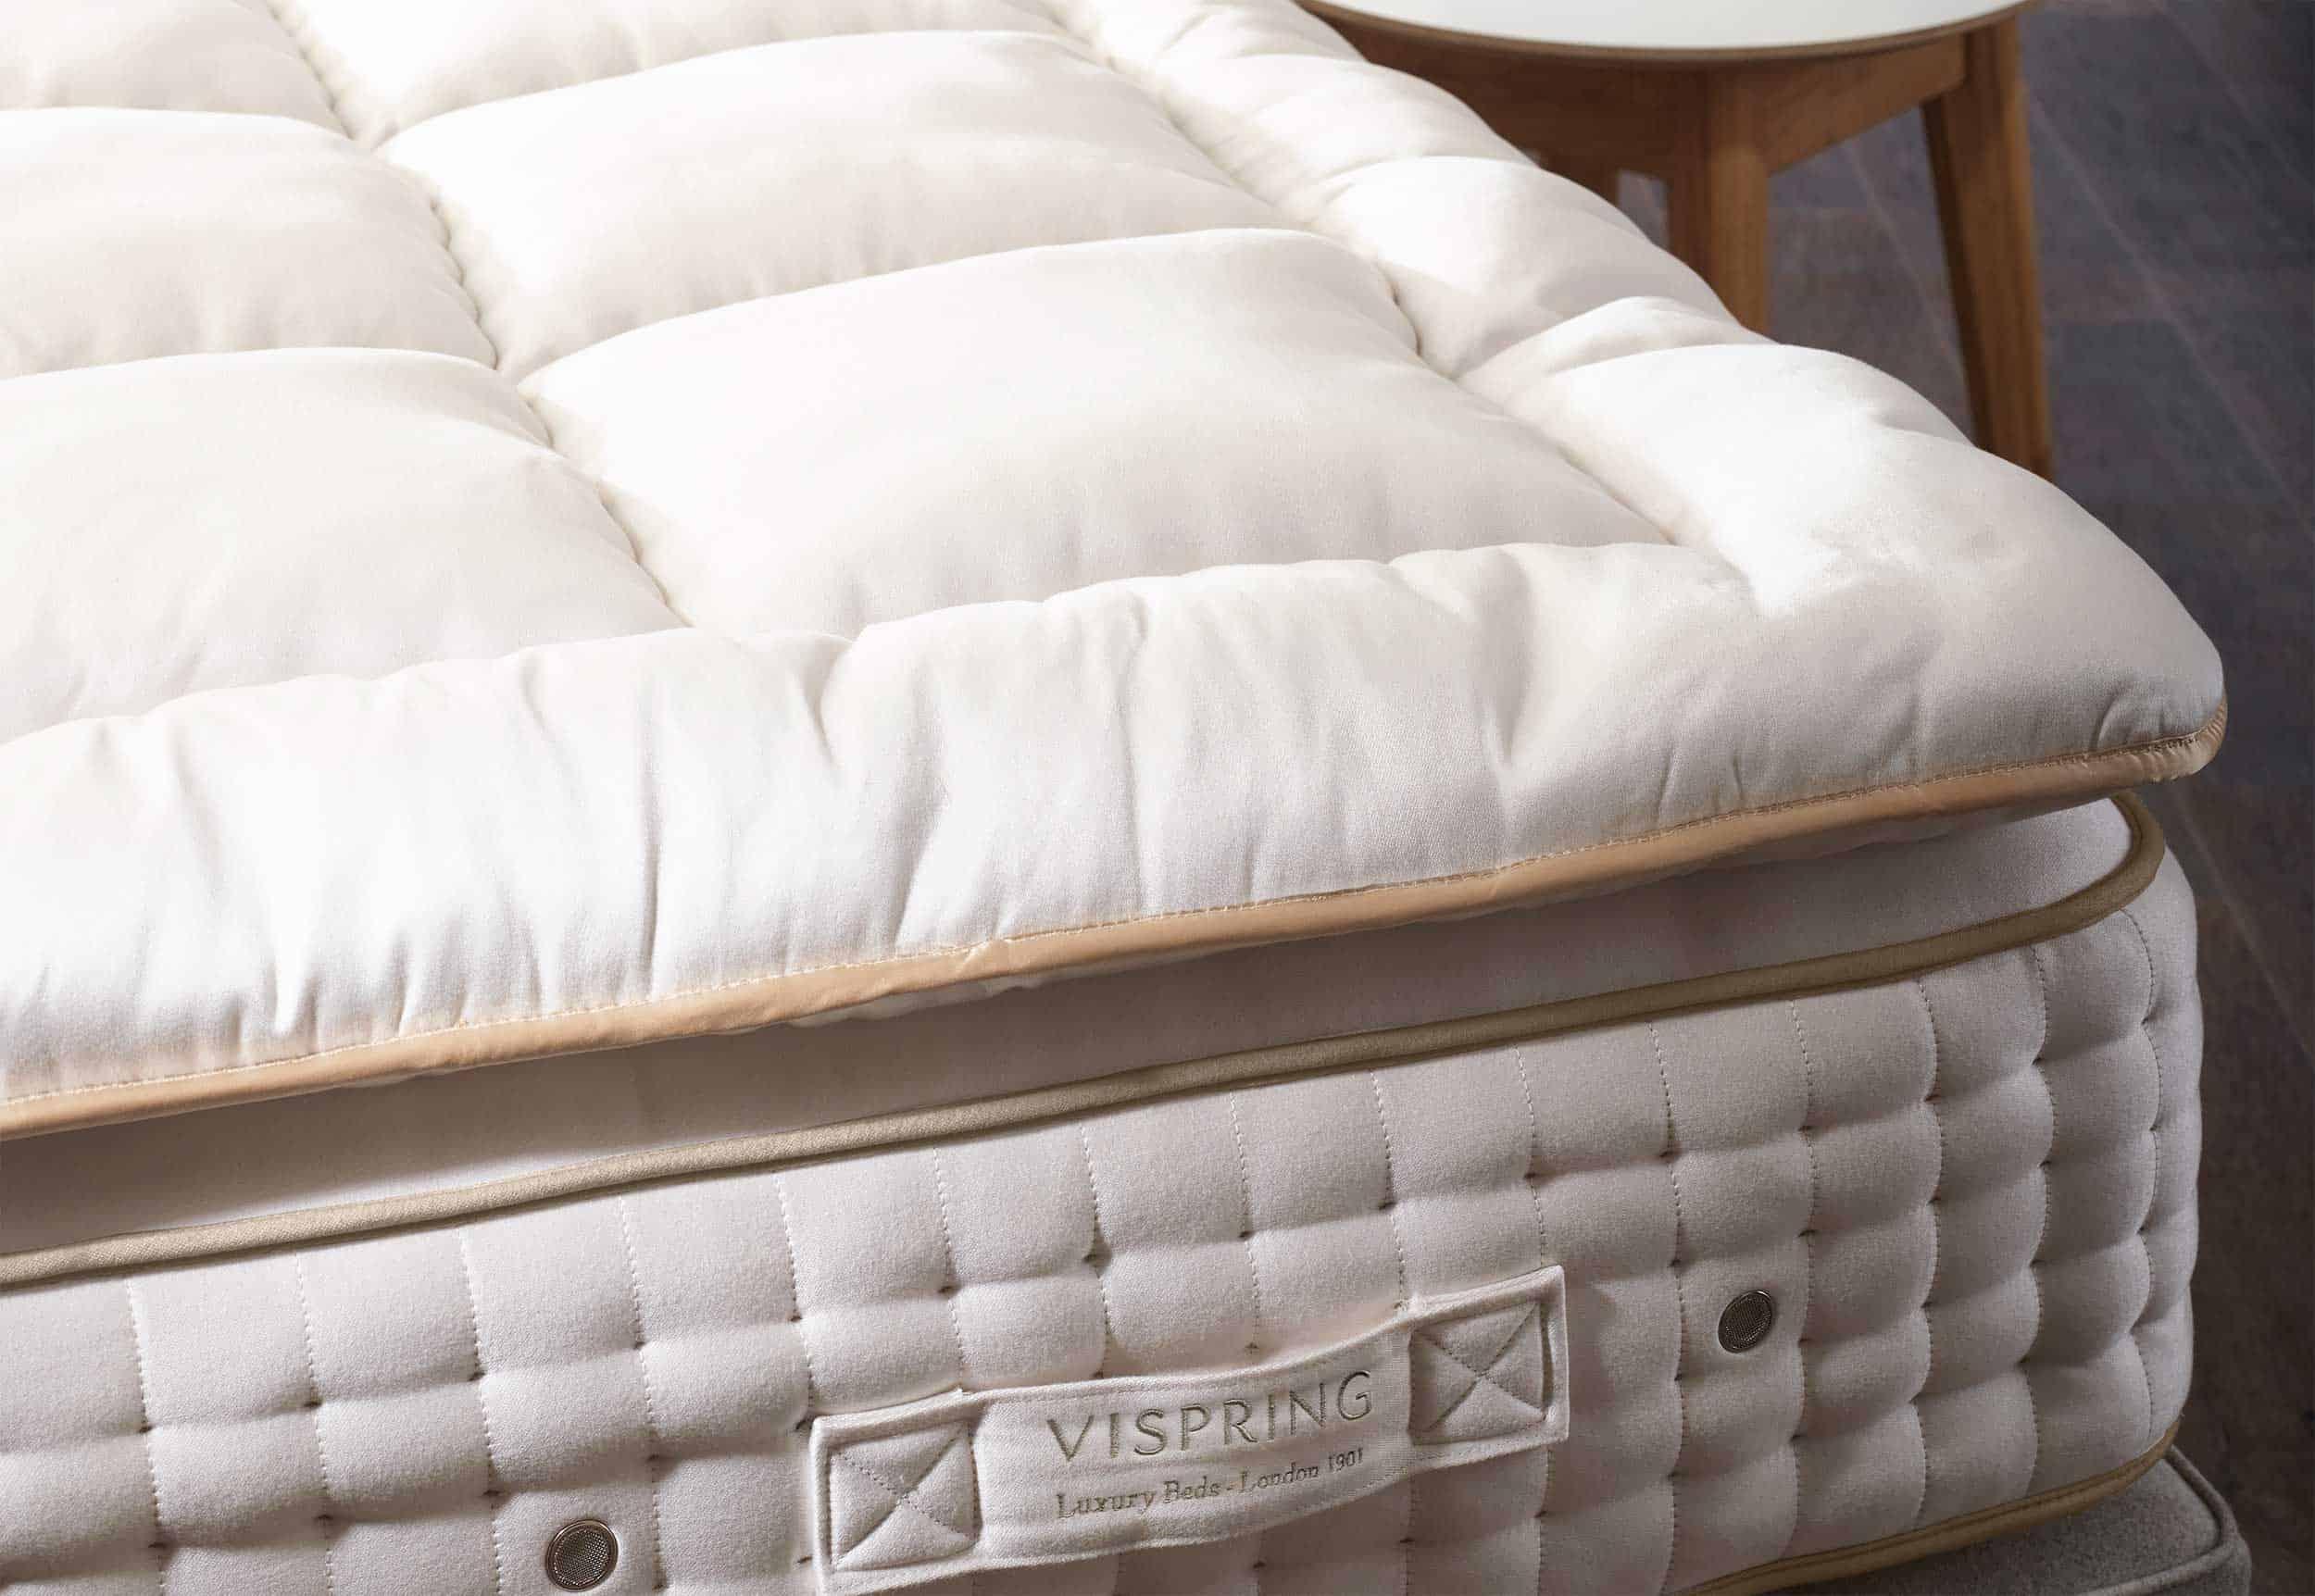 Vispring Topper sale 2020 at the sleep Luxury Bed store in Santana Row